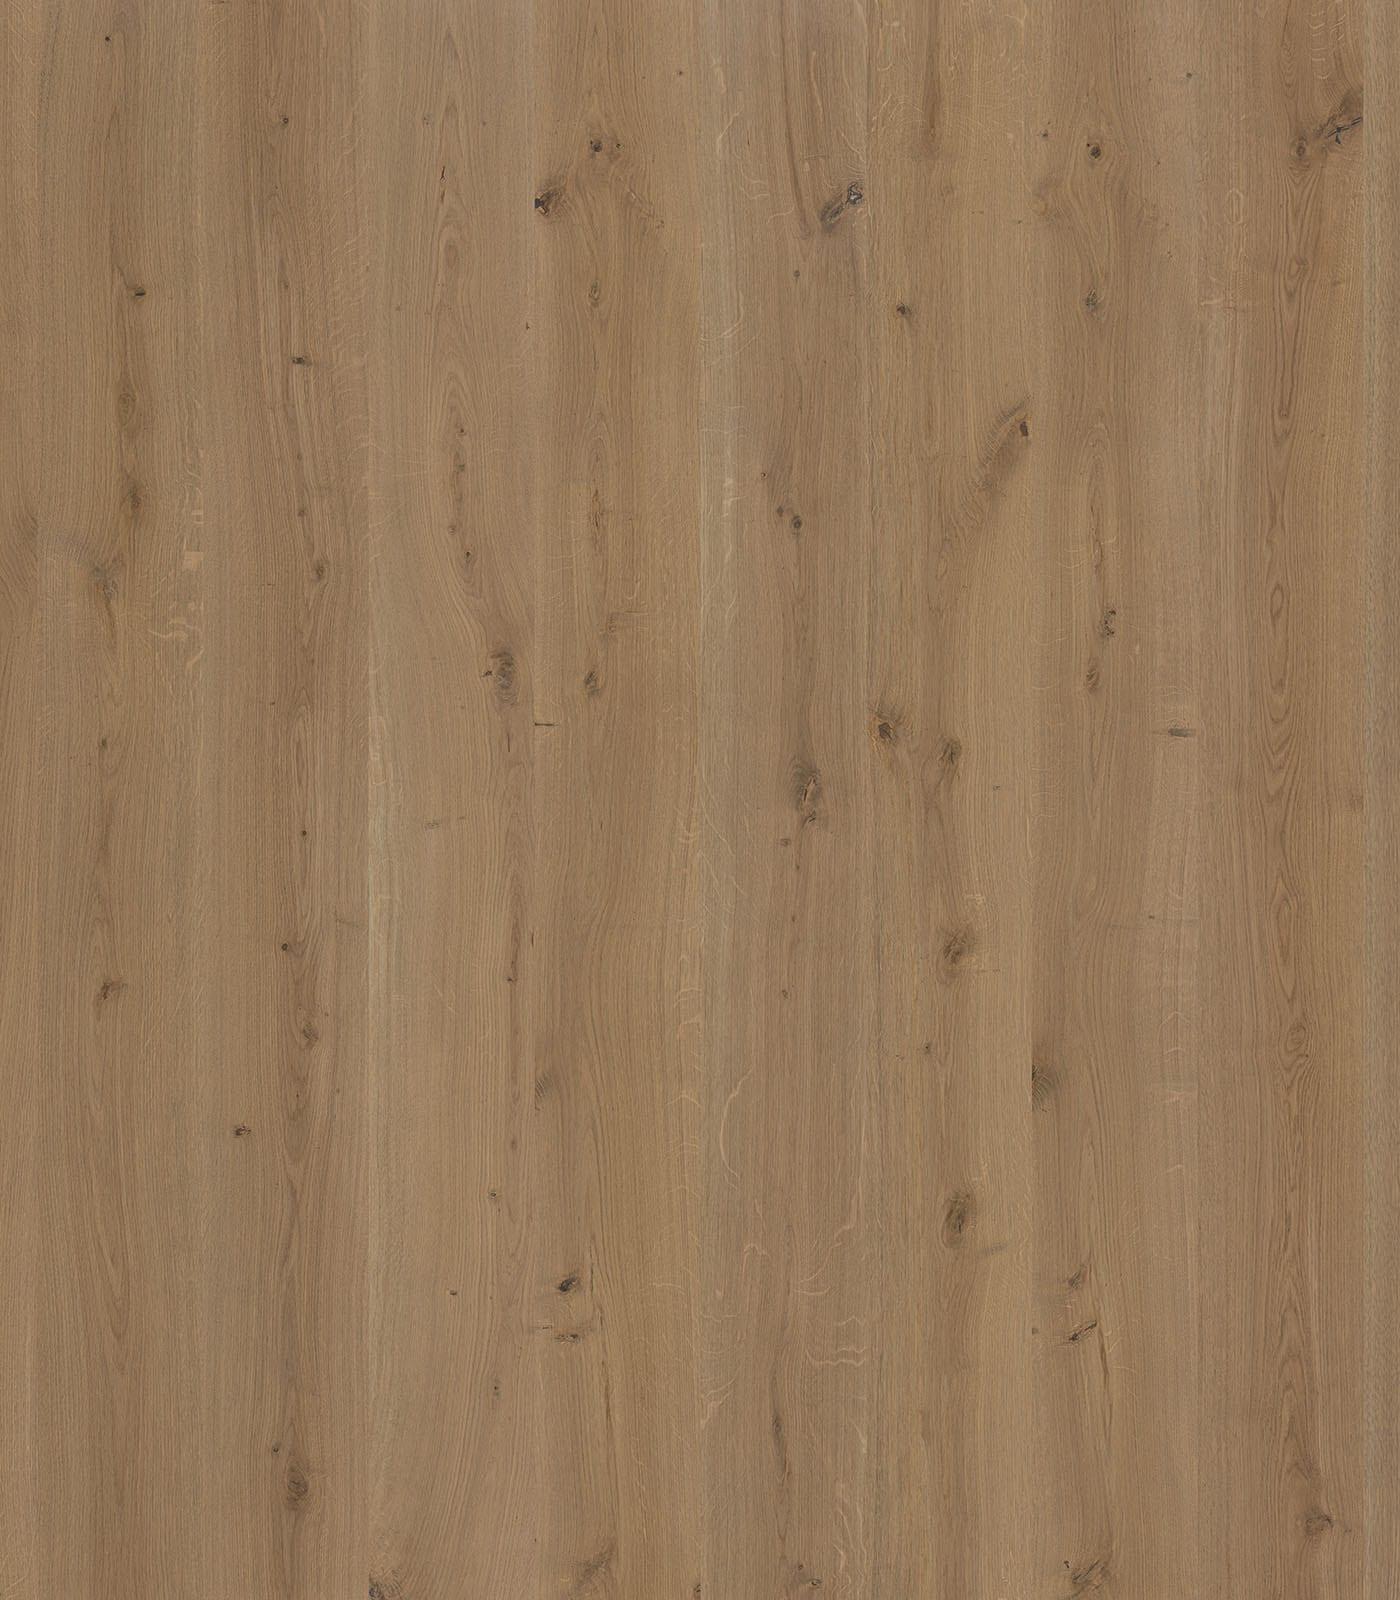 Ruaha-European Oak Floors-Lifestyle Collection-flat